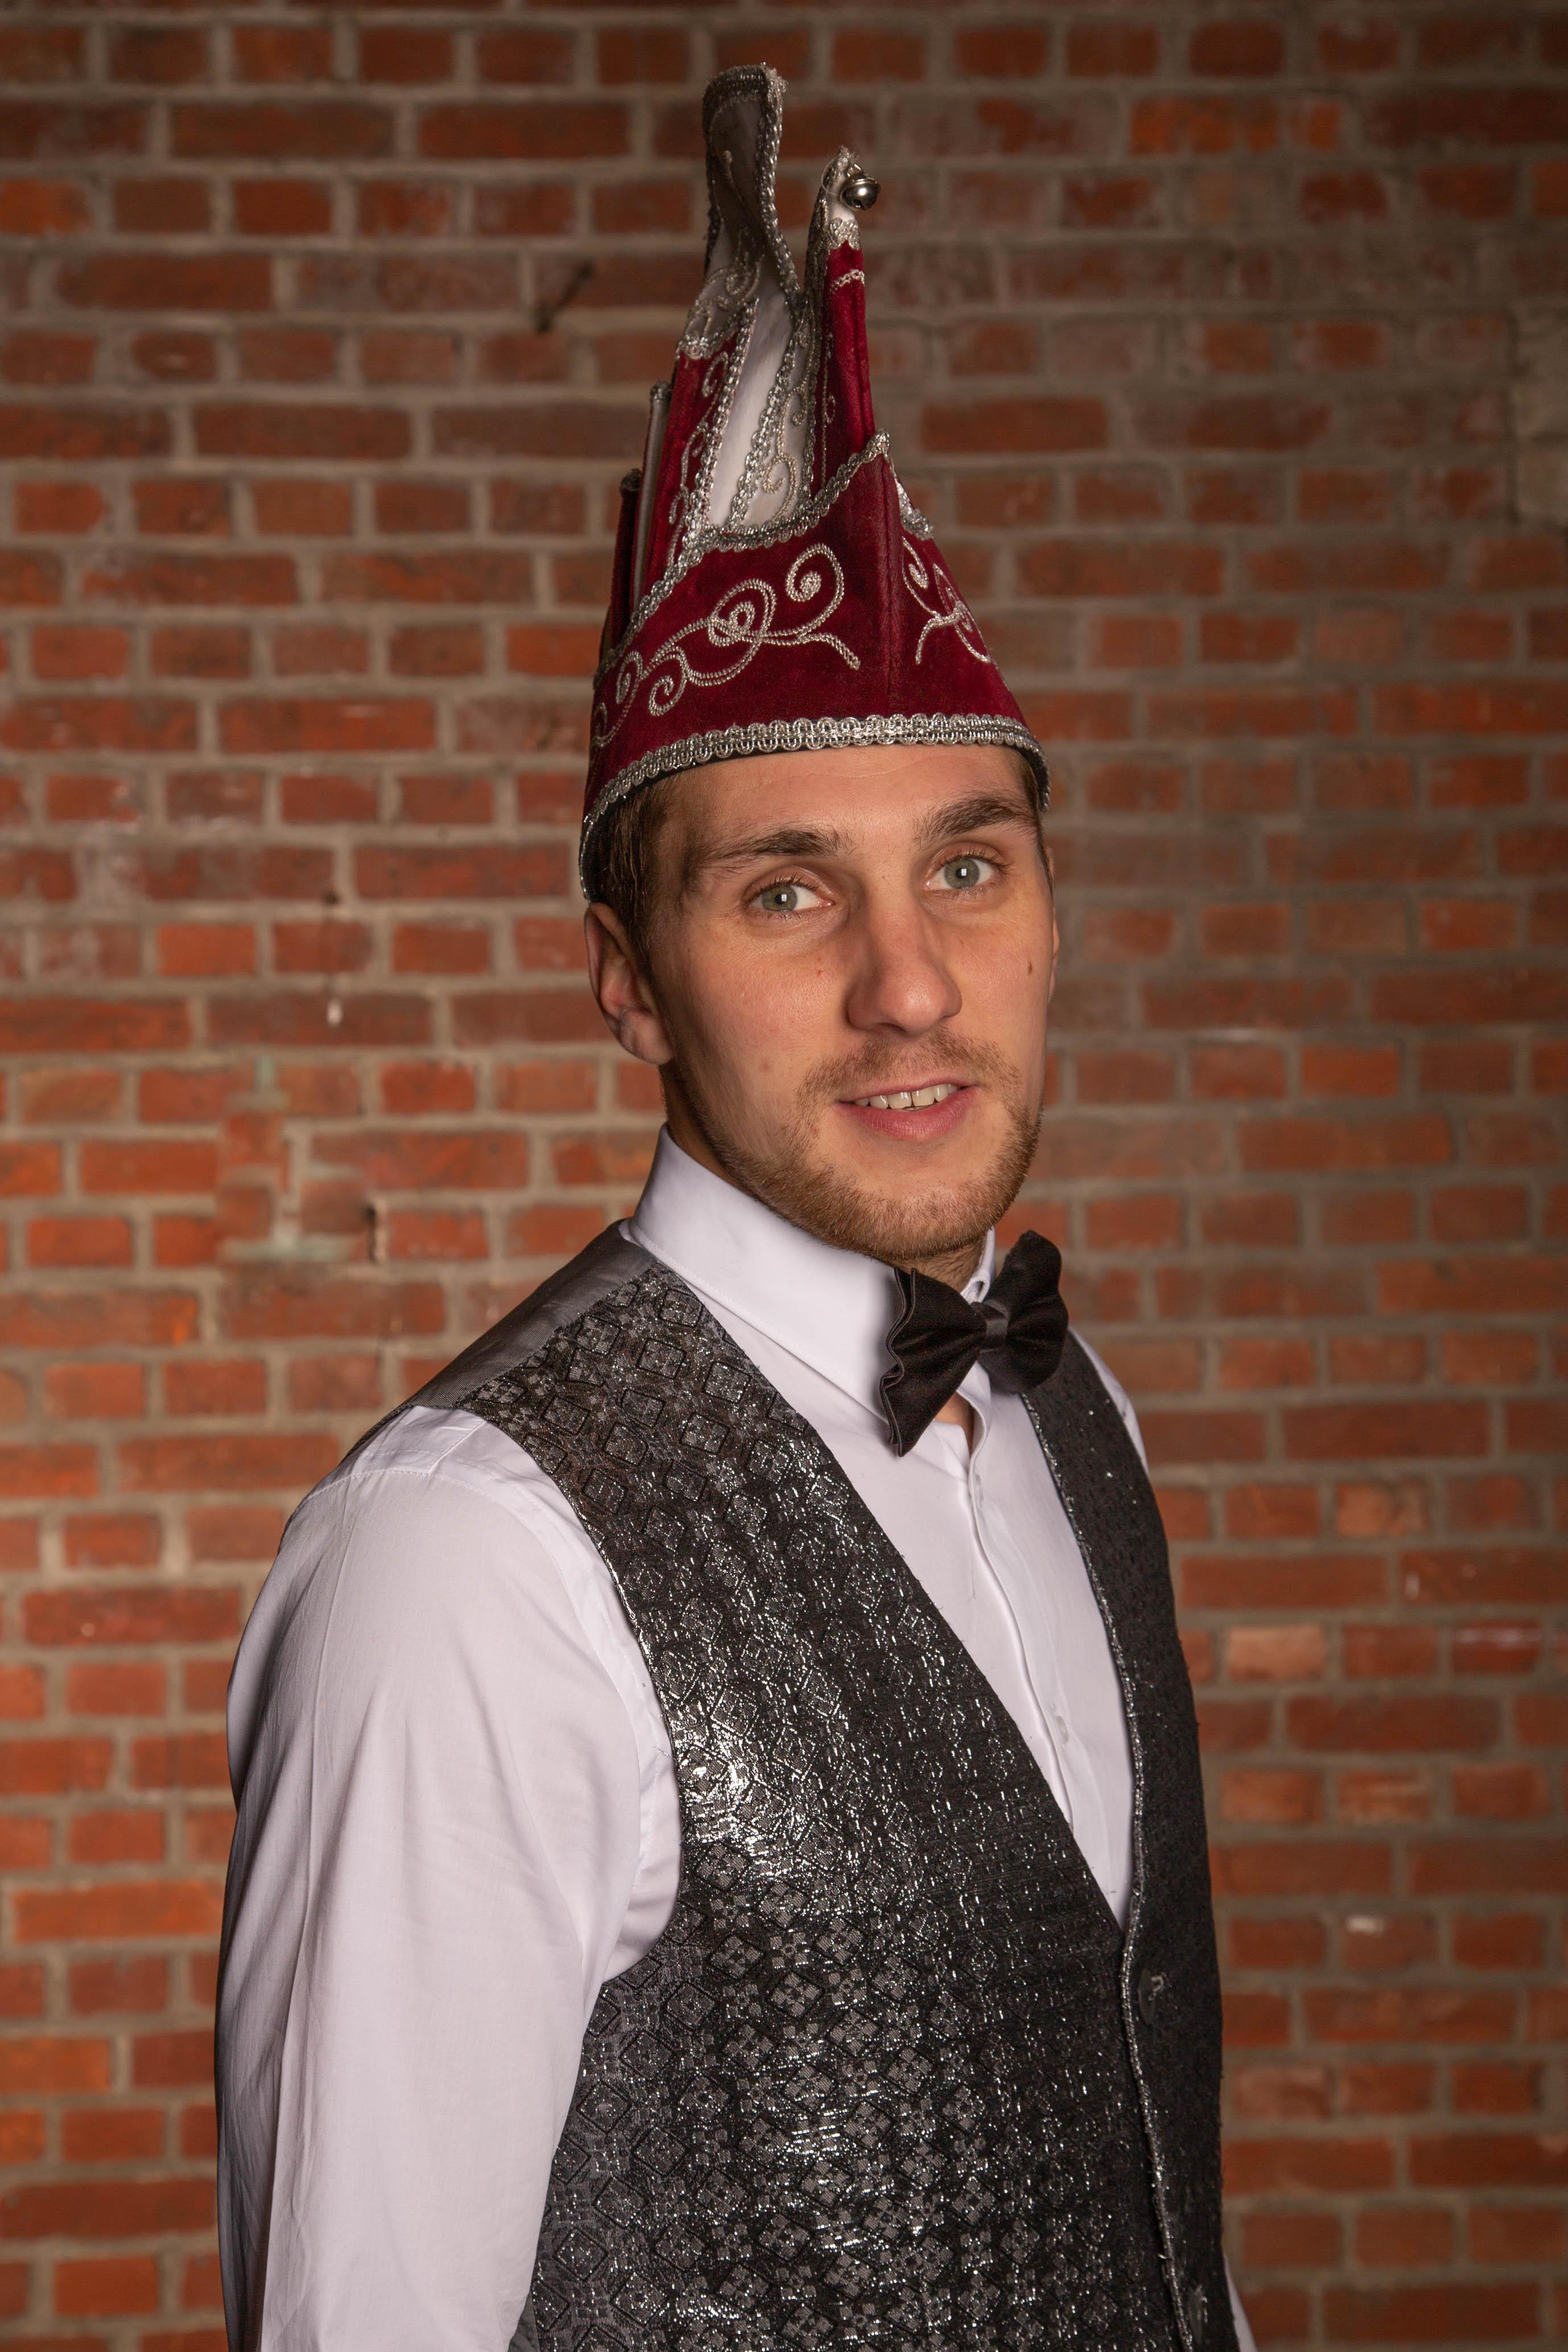 Jesper Bolte